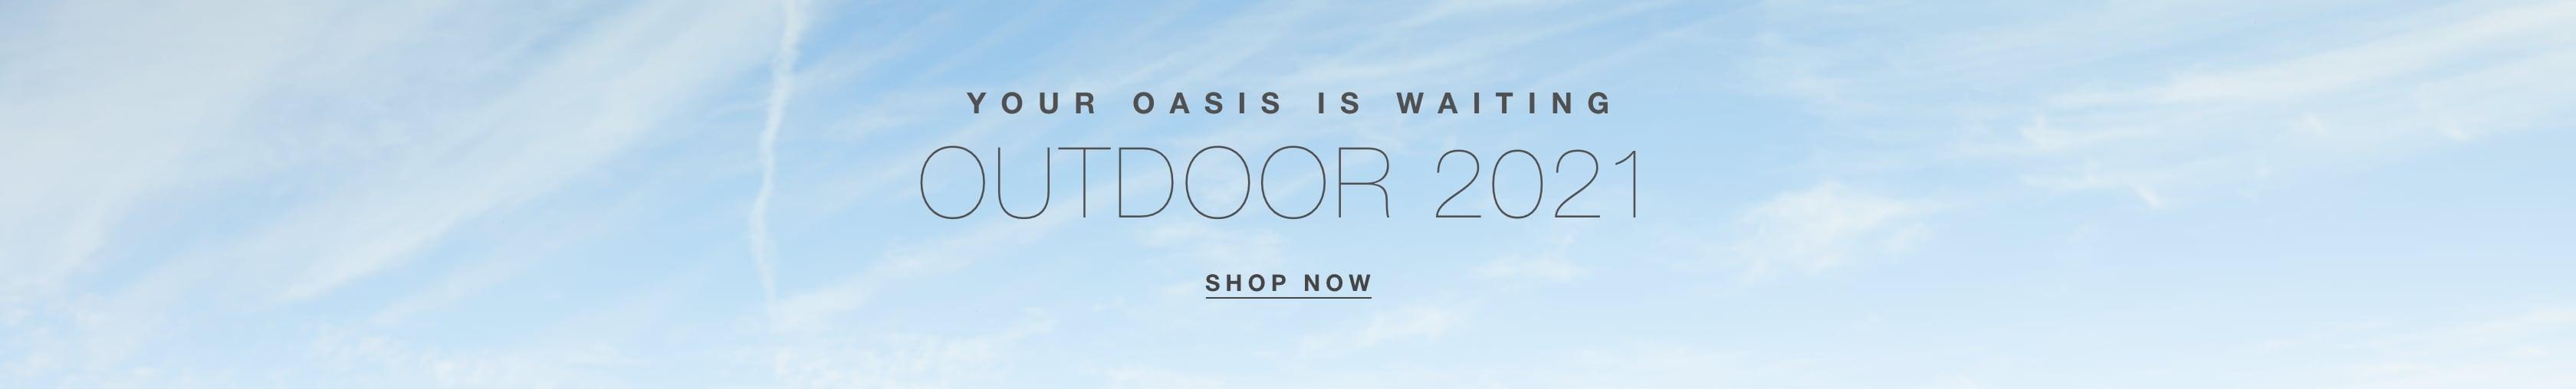 Shop the Arhaus 2021 Outdoor Collection